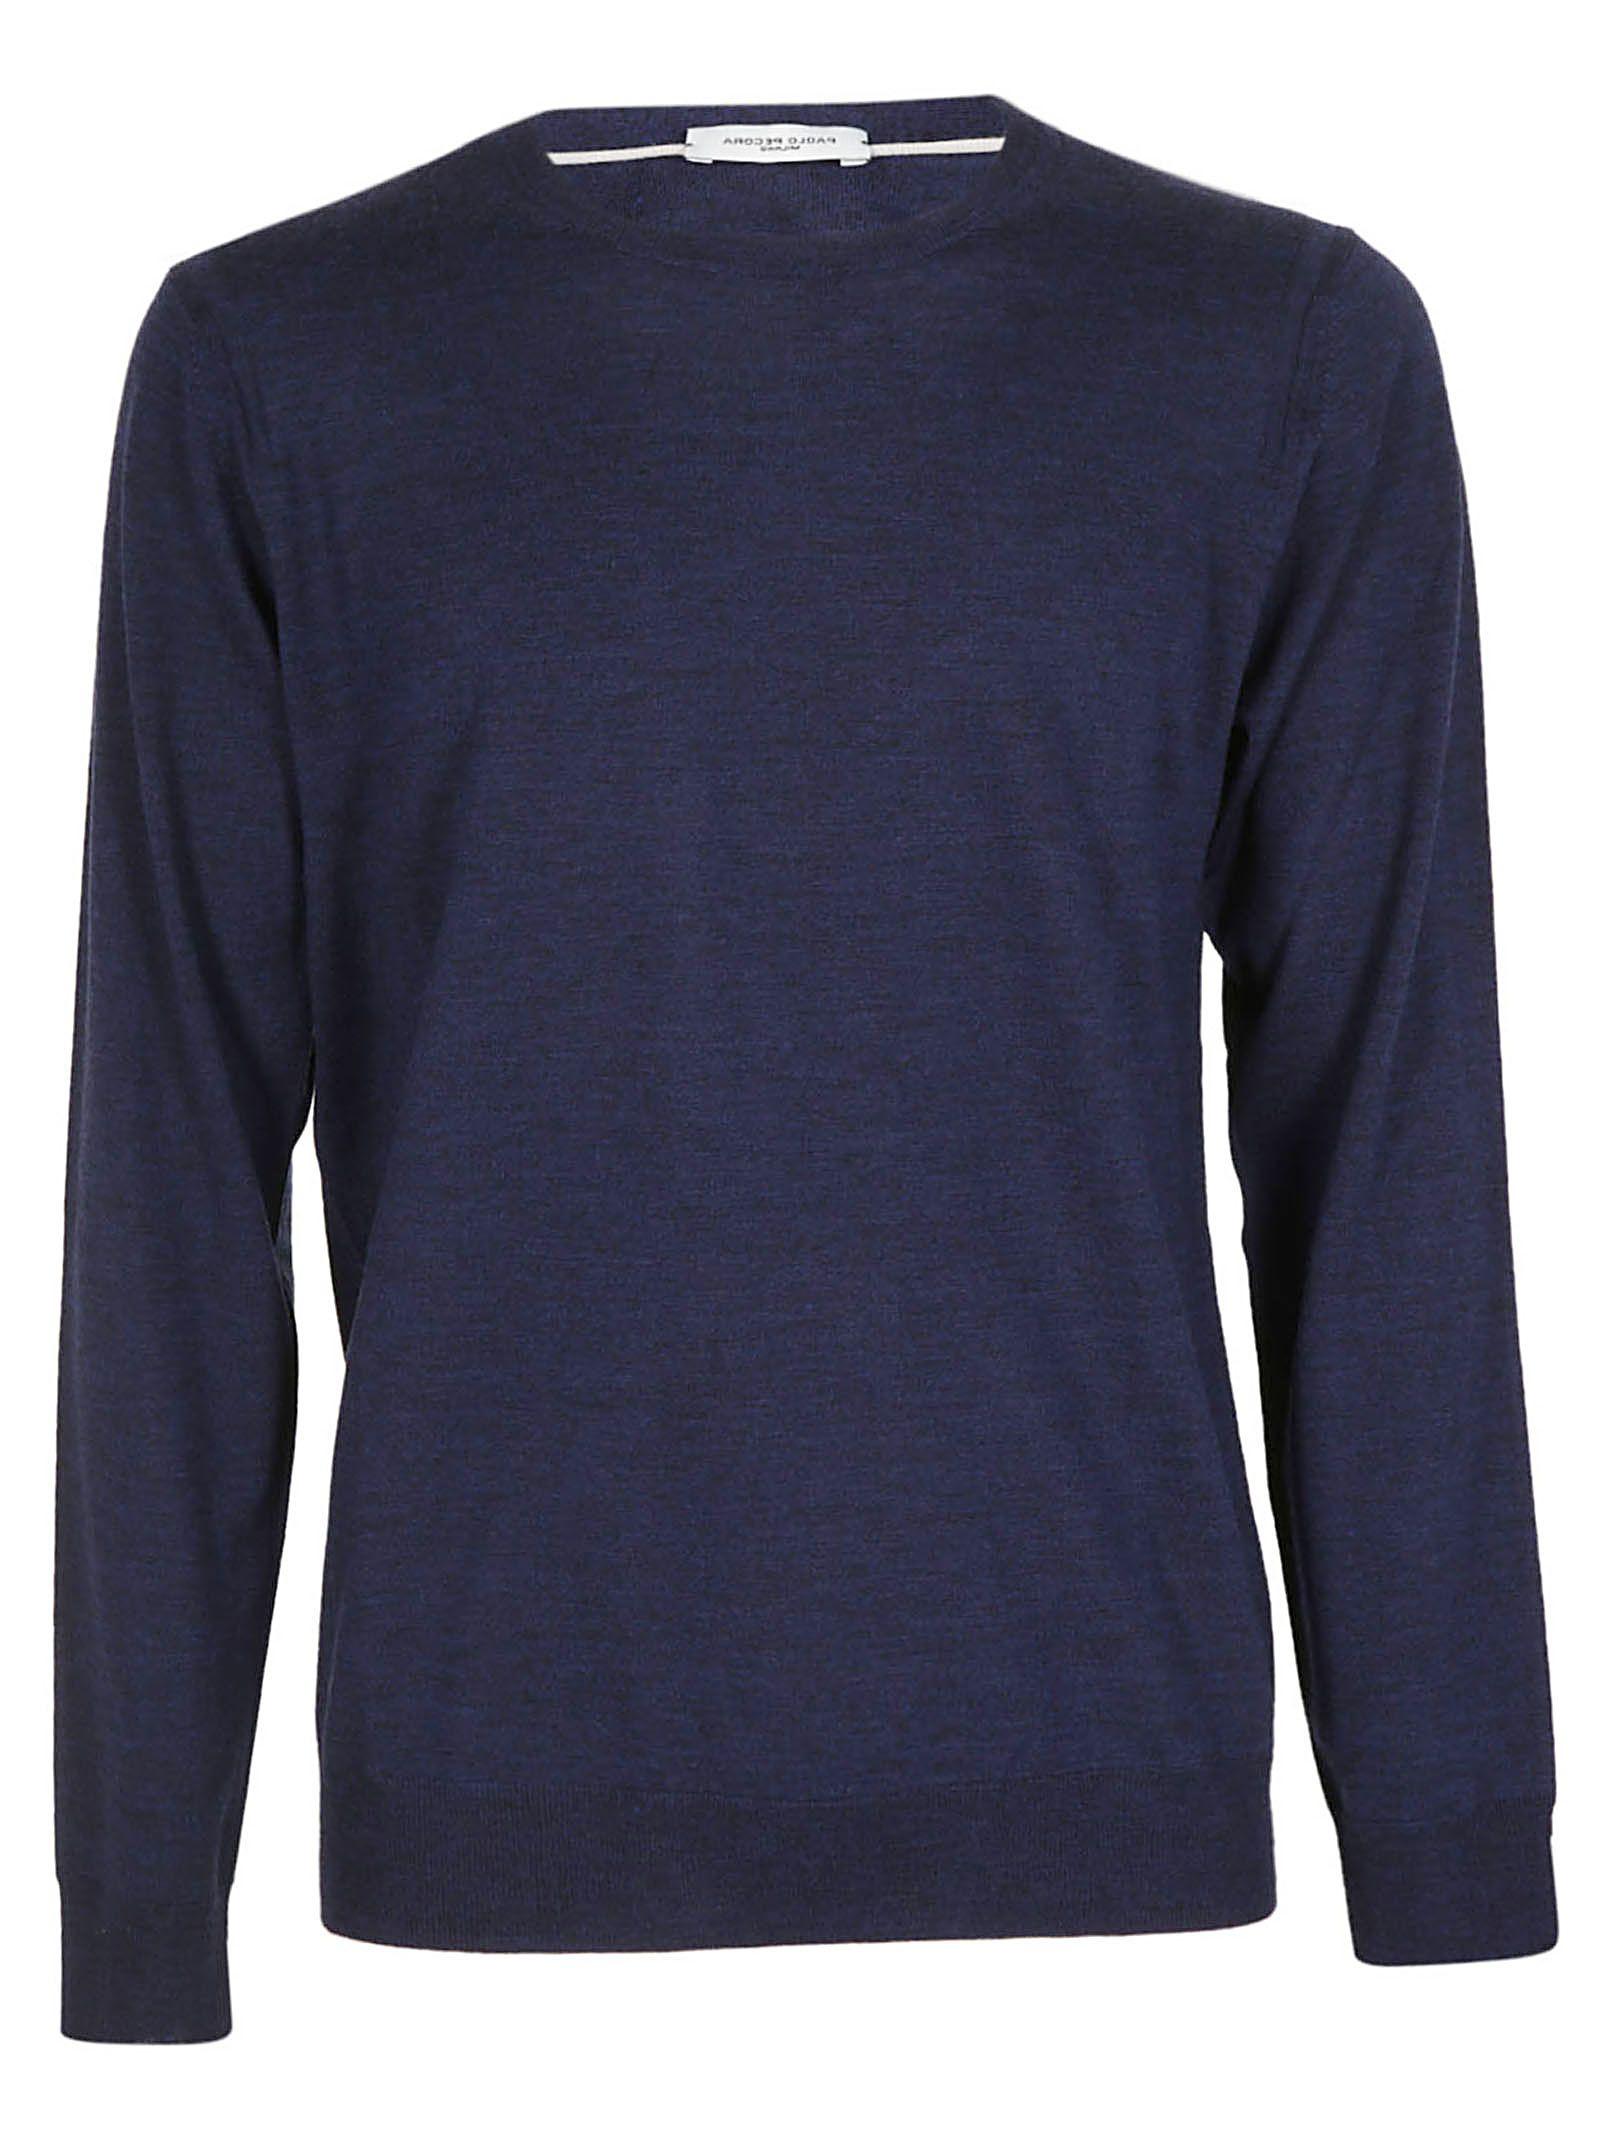 Paolo Pecora Round Neck Sweater